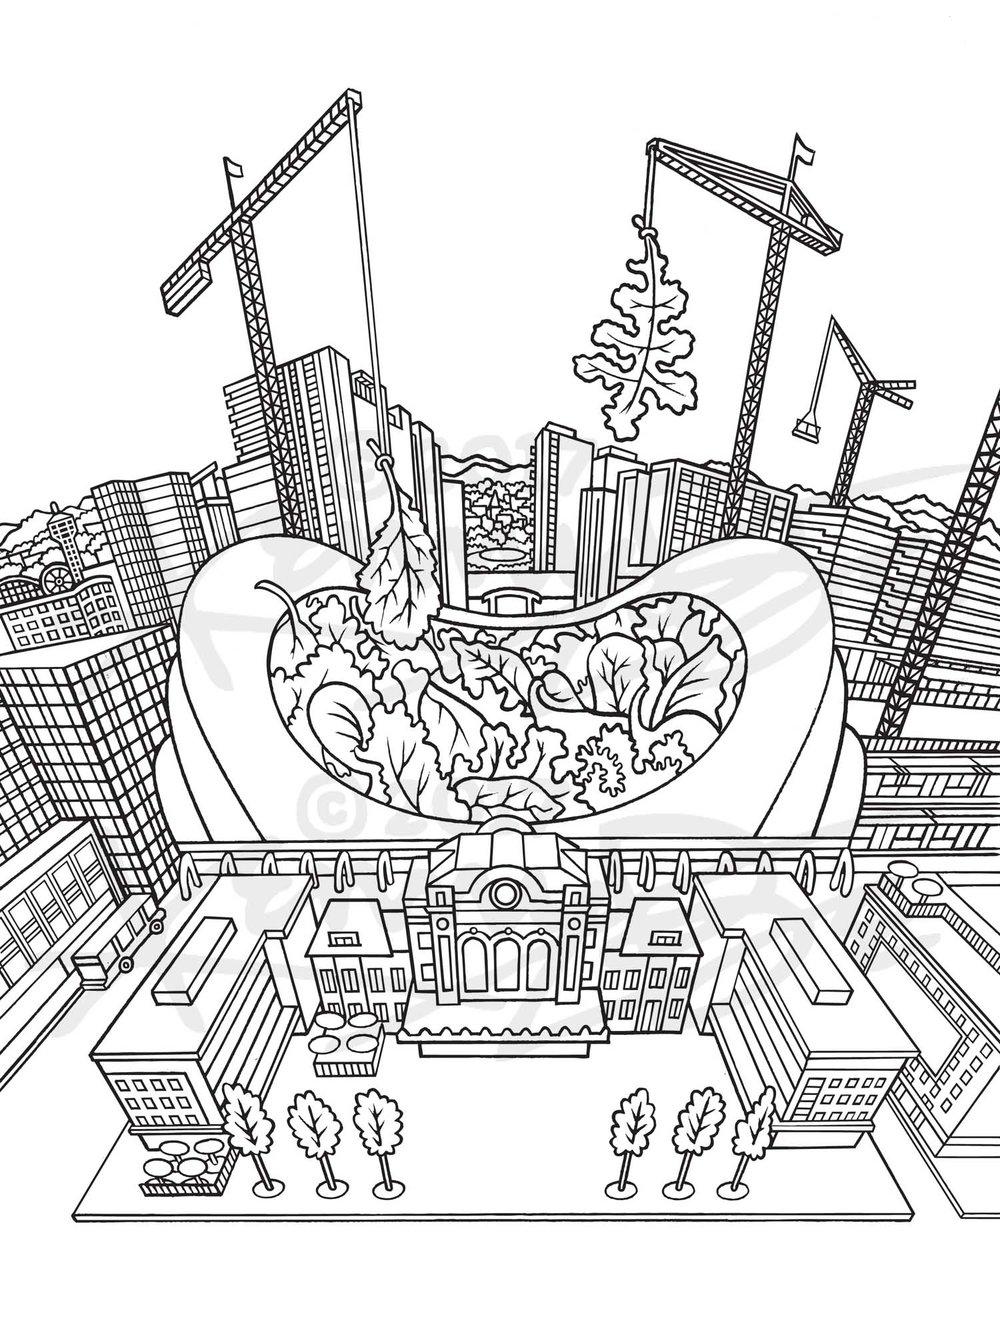 3. Union Station Mesclun Denver Neighborhood Seed Company Kenny Be Art & Design kennybe.com BW Line Art.jpg